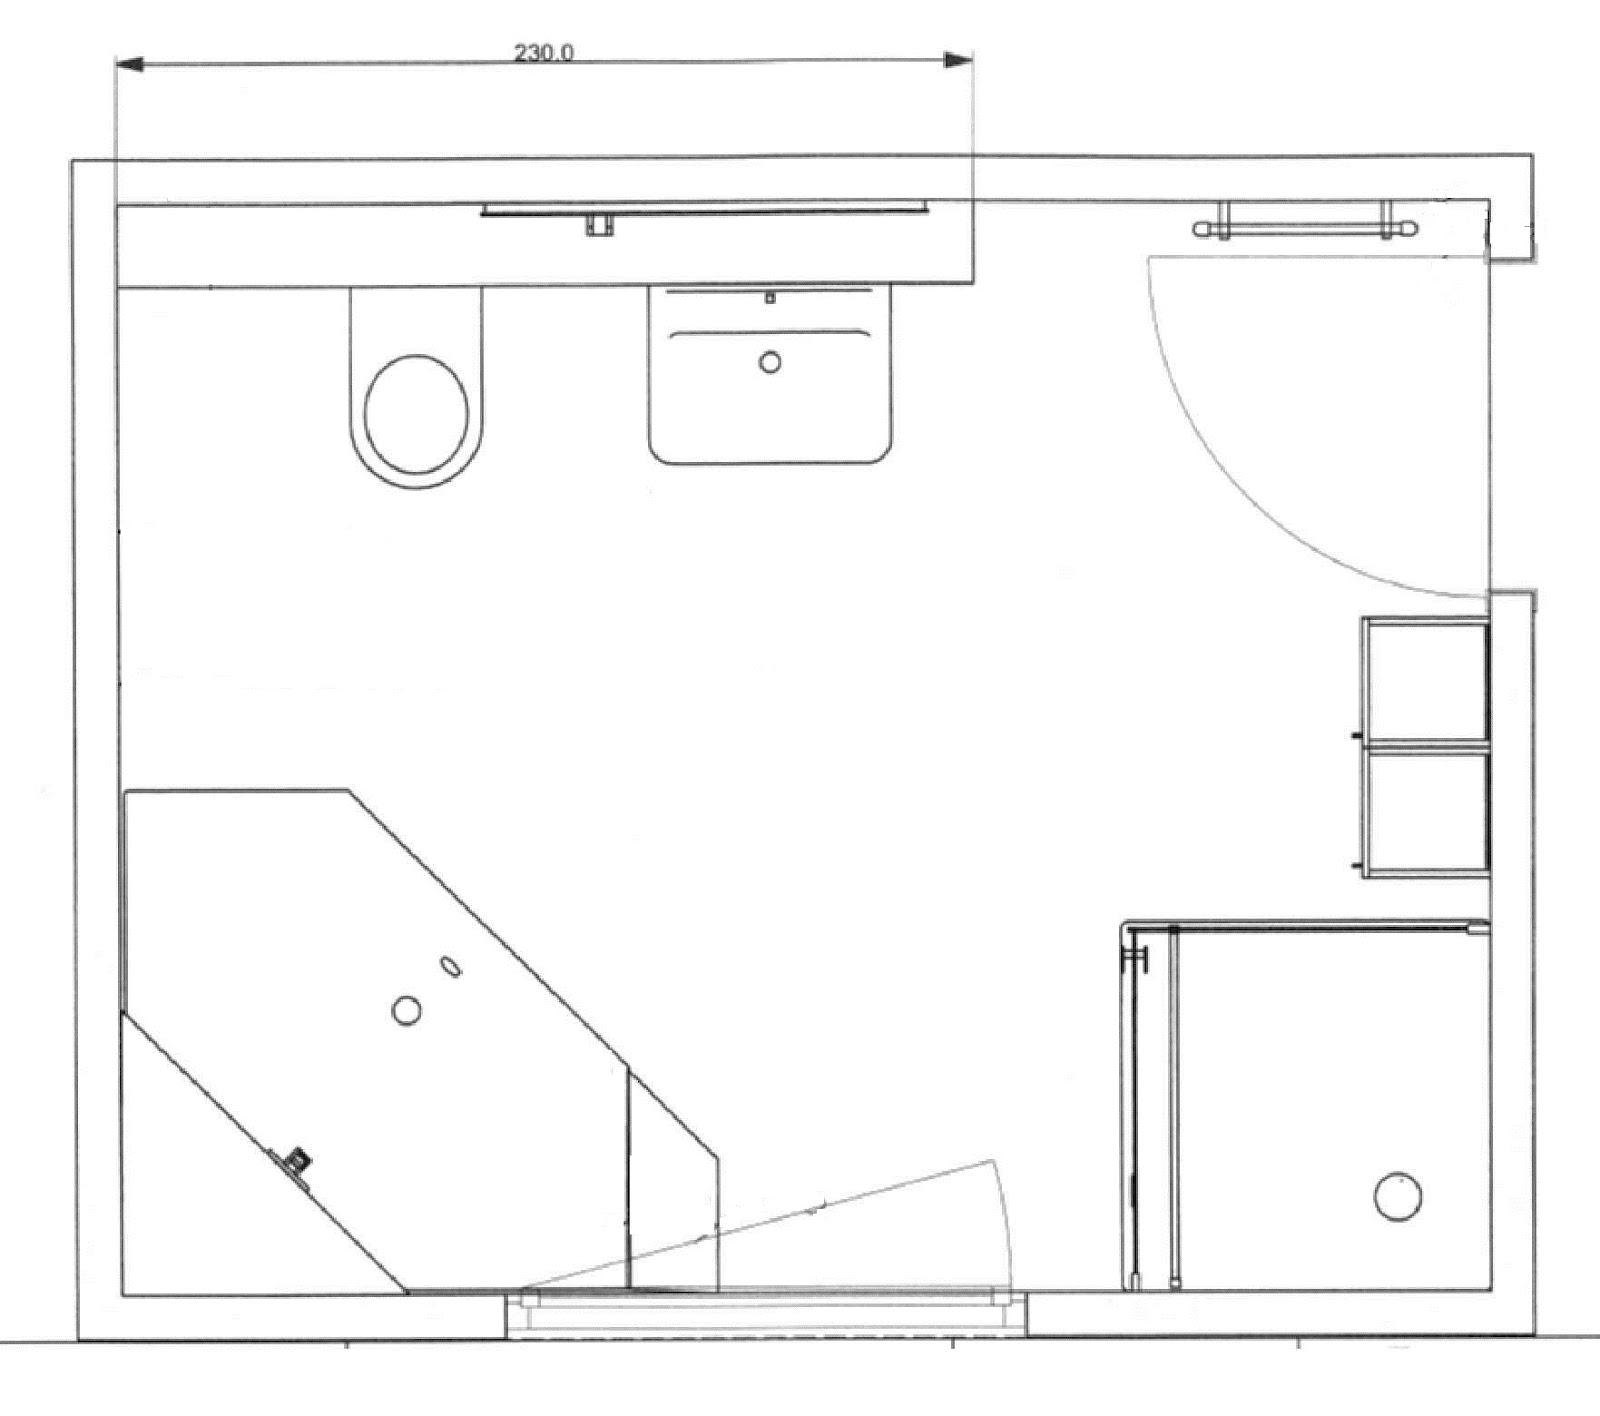 anita dirk s bautagebuch winkelbungalow badplanung bemusterung sanit r. Black Bedroom Furniture Sets. Home Design Ideas